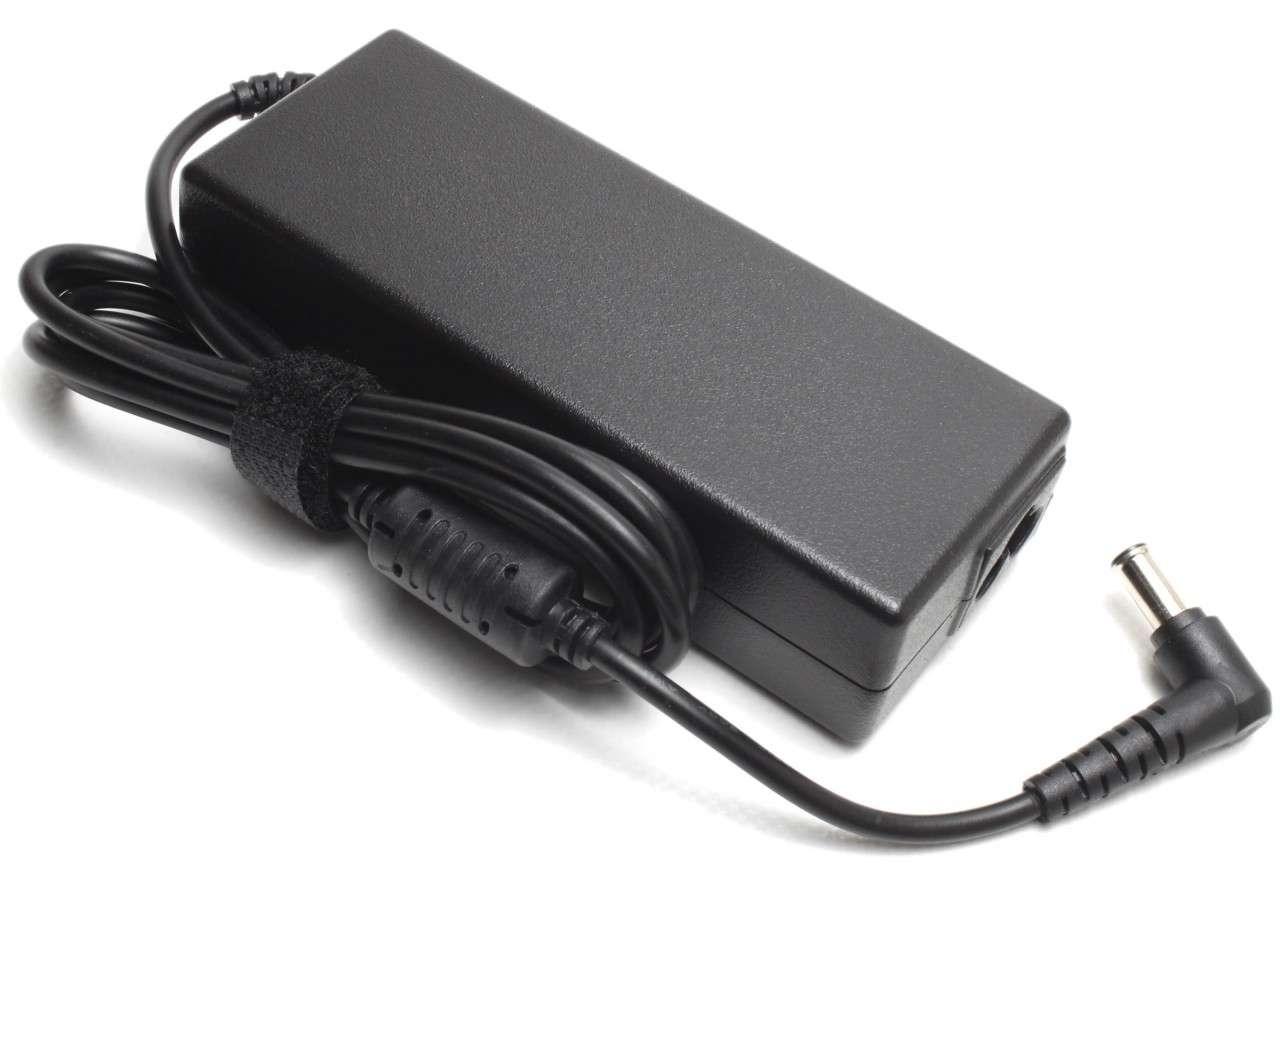 Incarcator Sony Vaio VPCEB42FM Replacement imagine powerlaptop.ro 2021